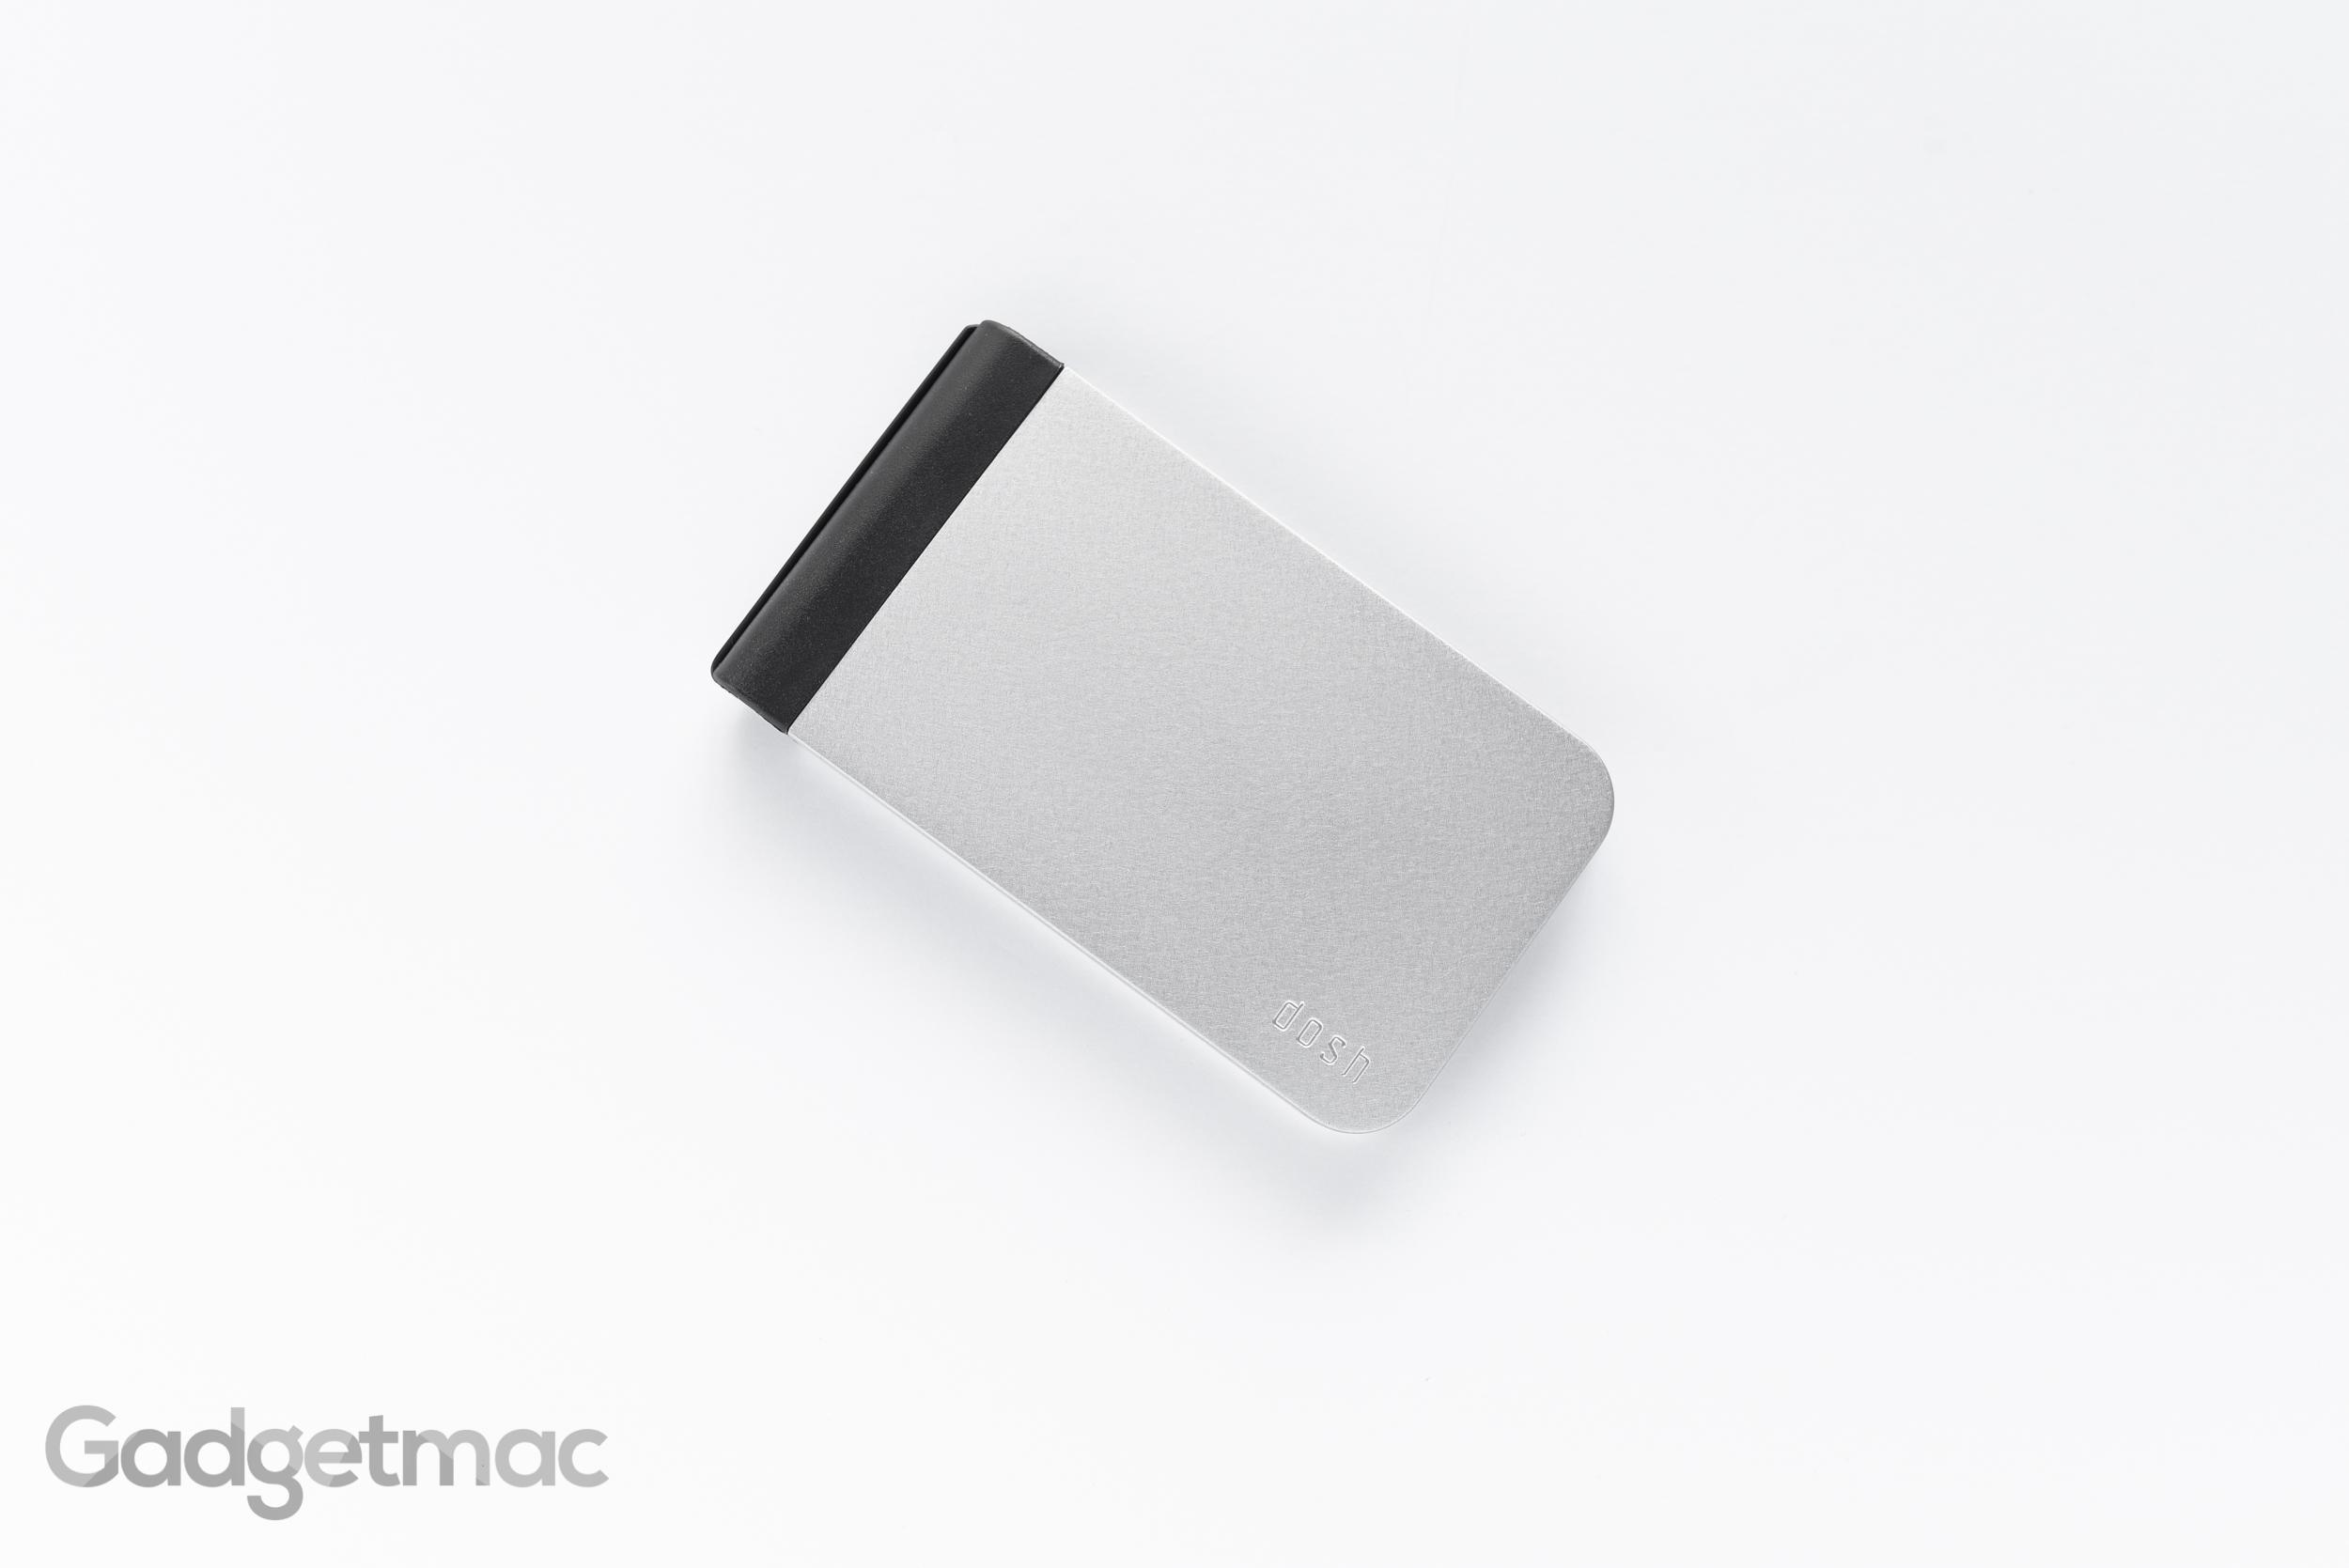 dosh_alloy_aluminum_card_wallet_with_rfid_shielding.jpg